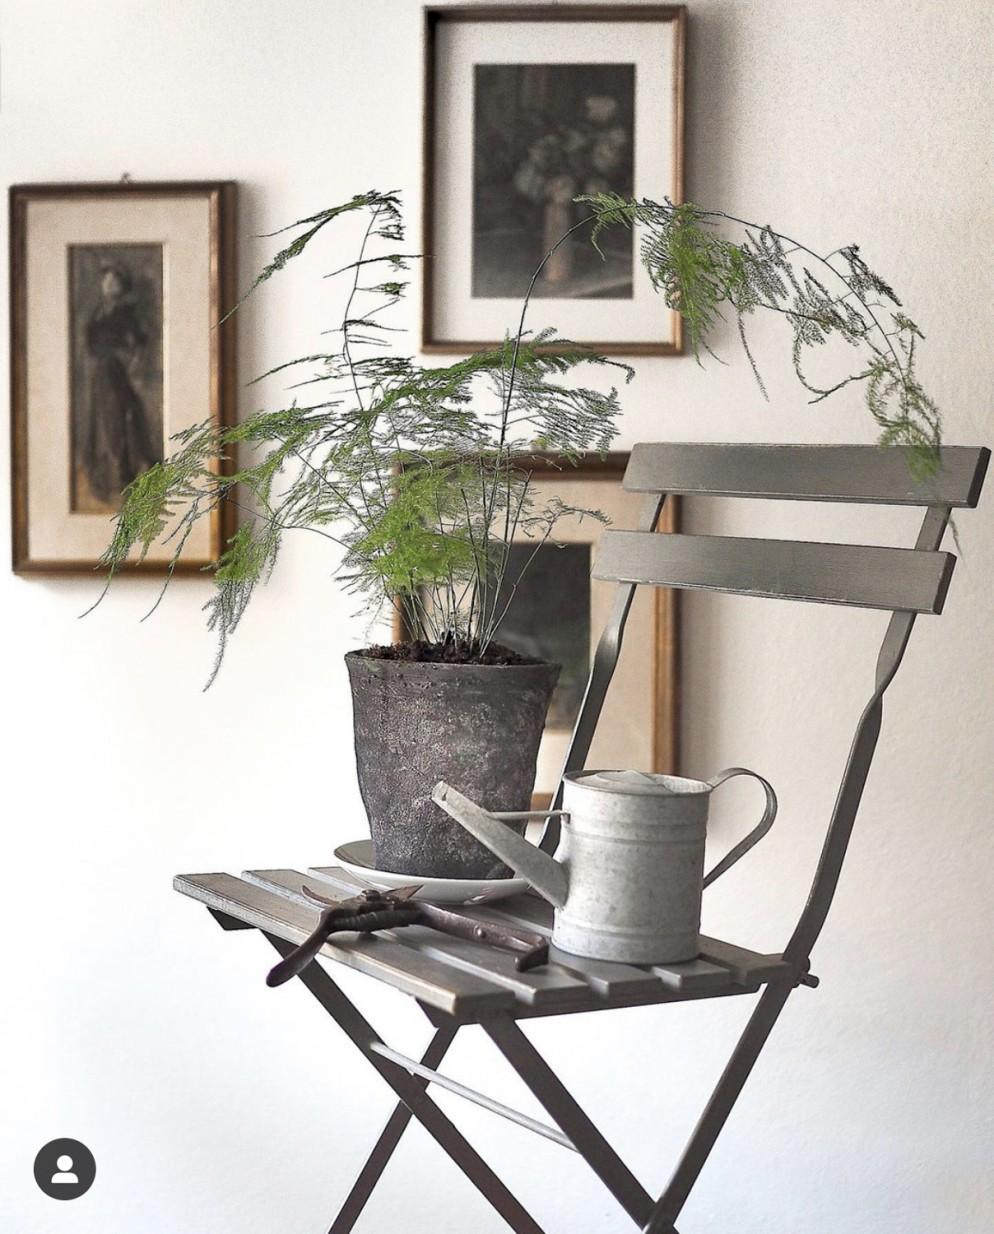 piante-eleganti-appartamento-9. Felce asparagina @aboutgarden-living-corriere